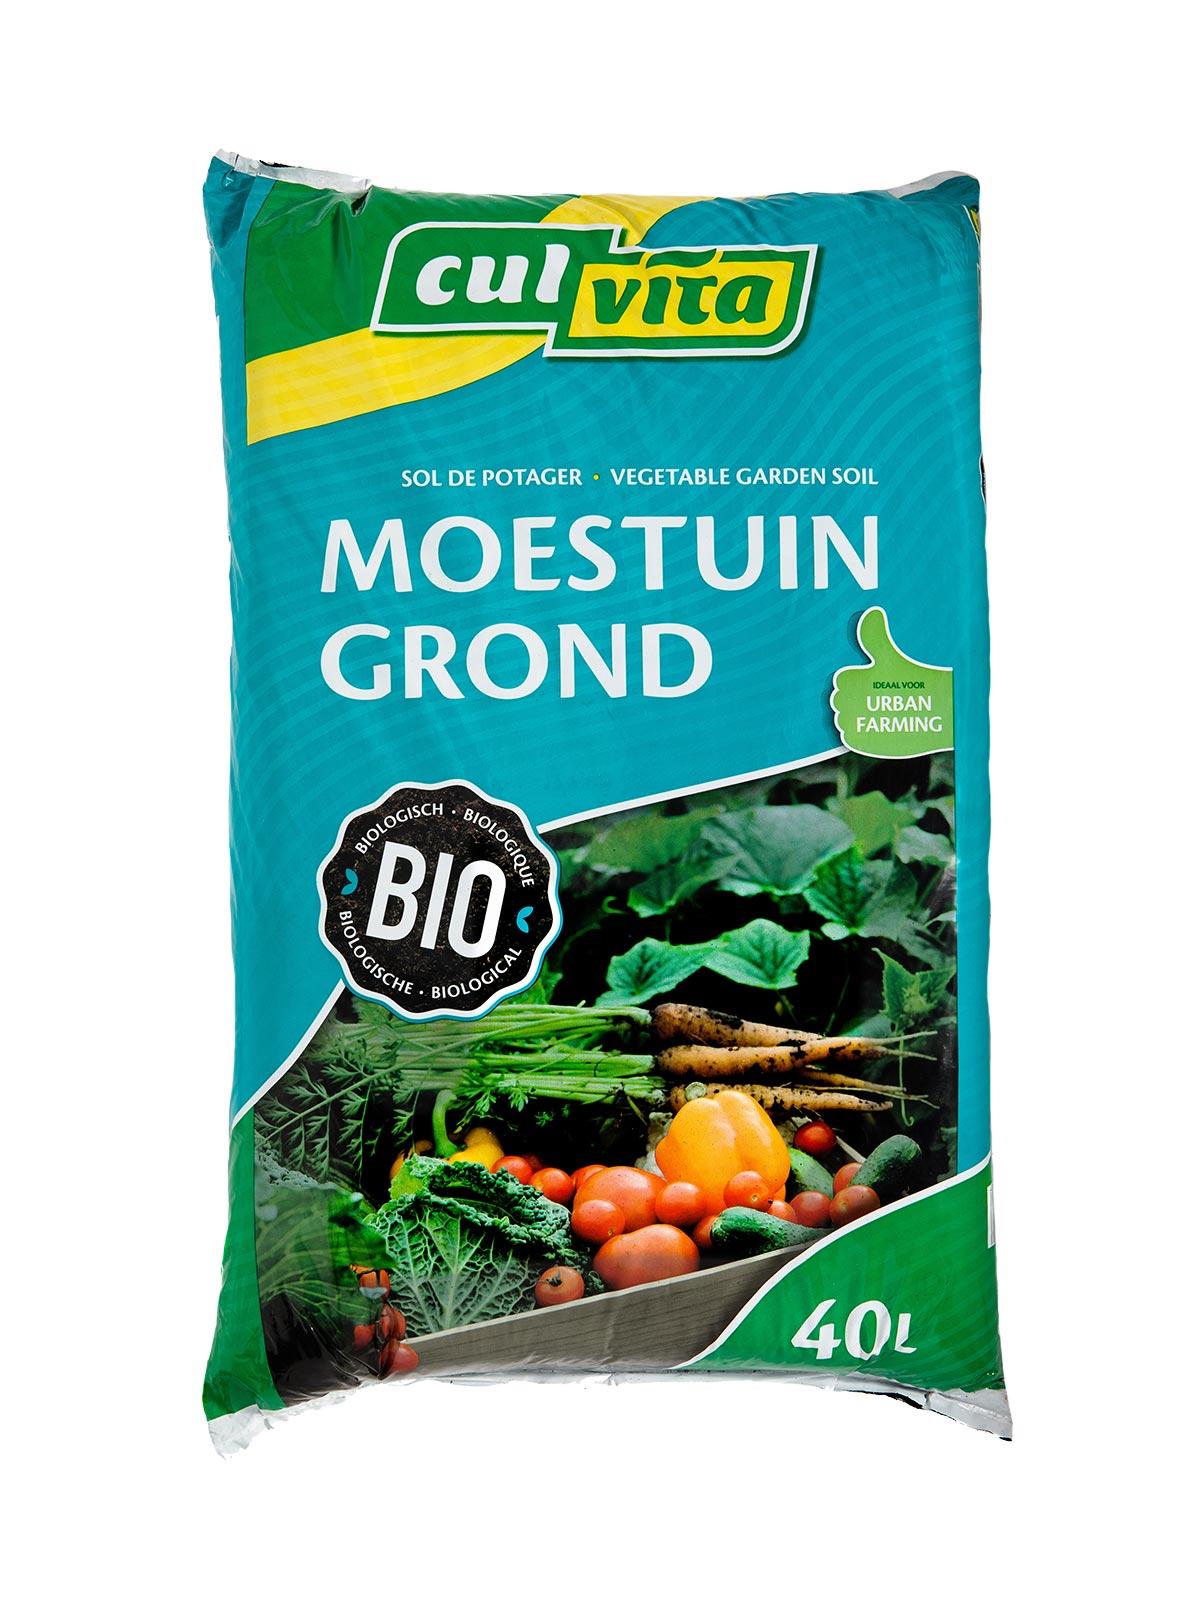 Culvita Biologische Moestuingrond   Culvita.nl